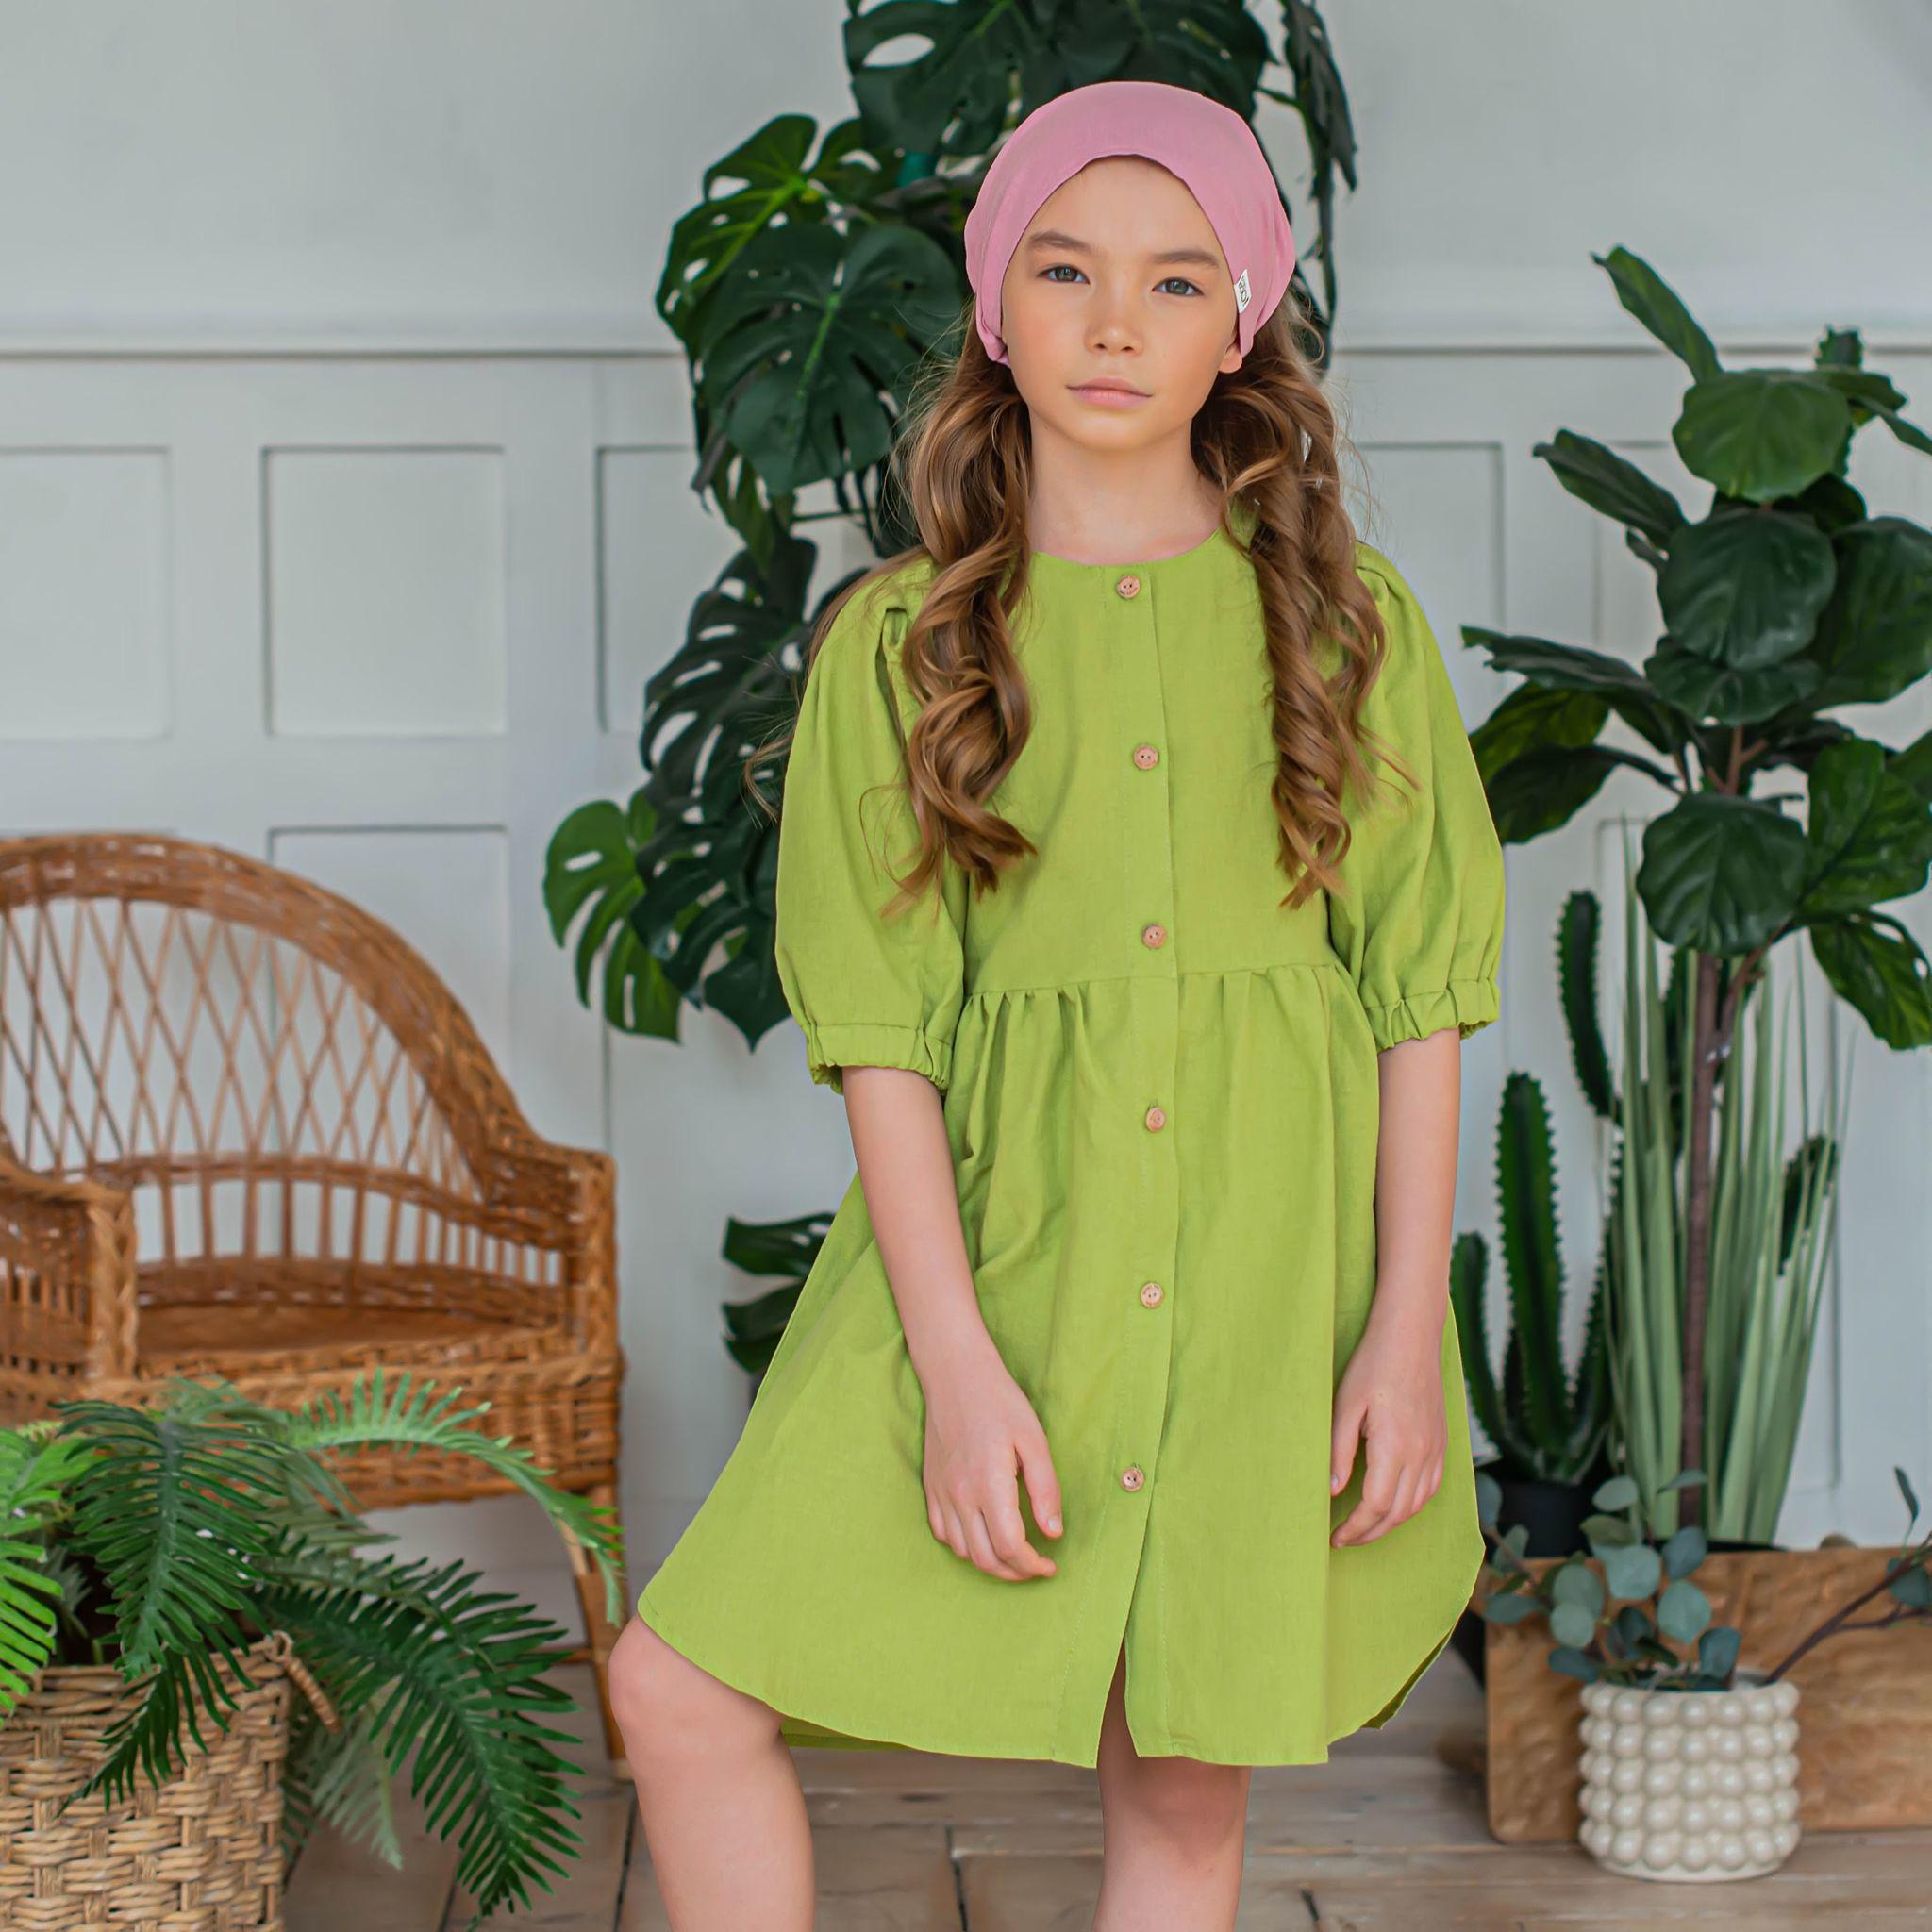 Cotton shirt dress for teens - Lime